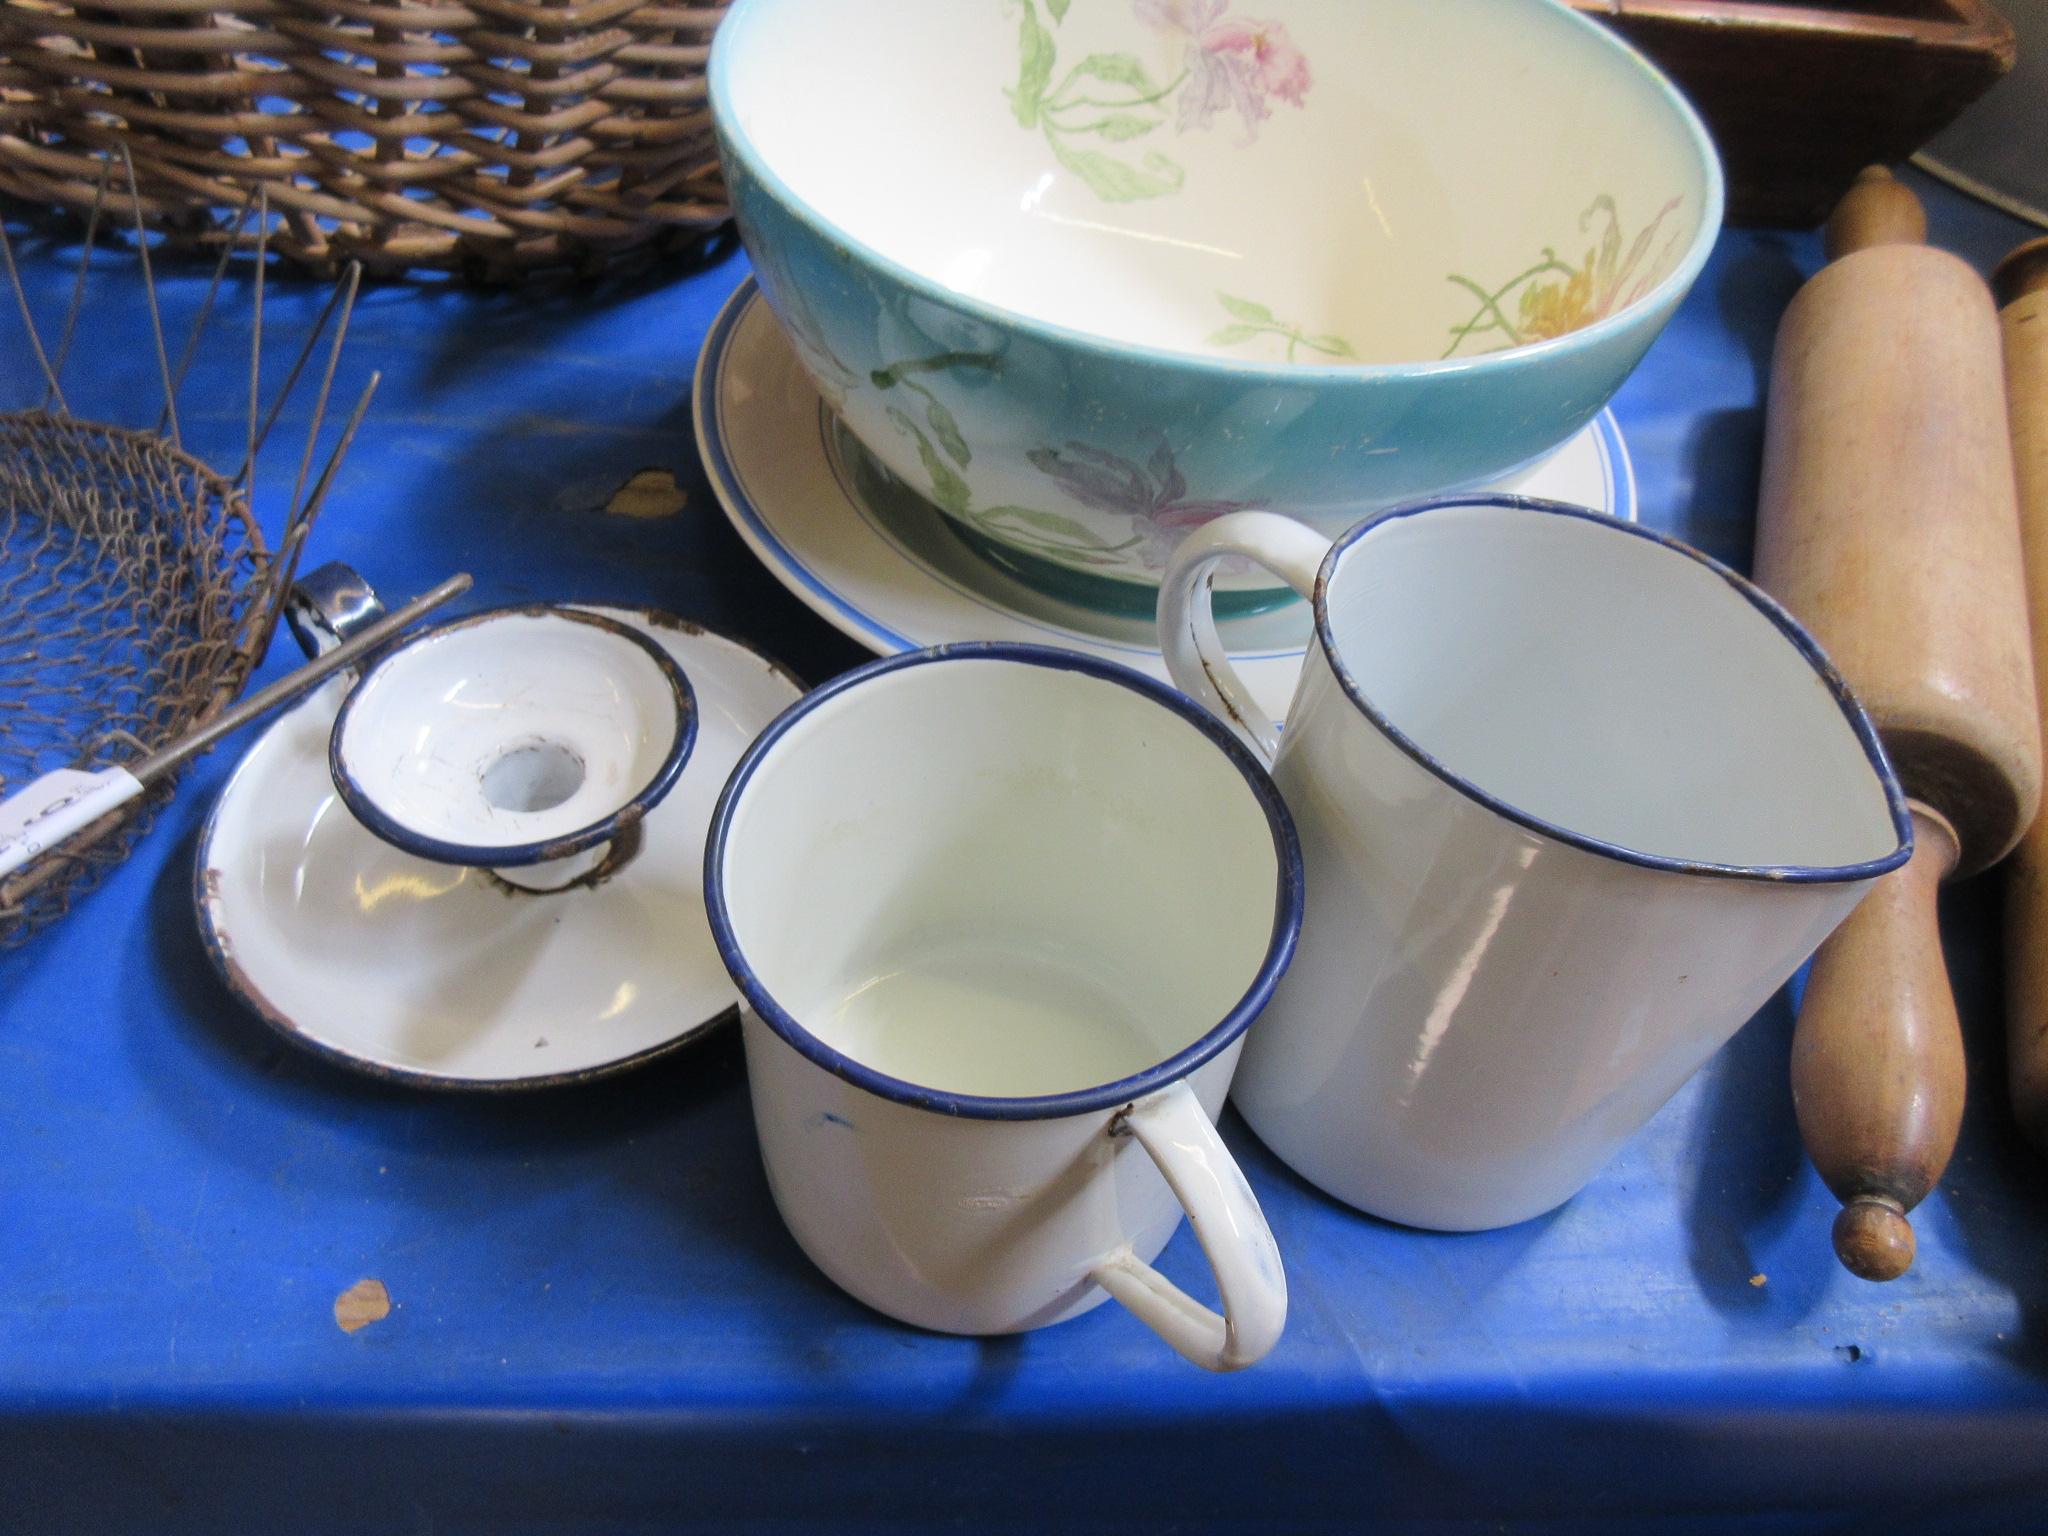 Lot 45 - Three enamelled pieces comprising measuring jug, mug, and candleholder